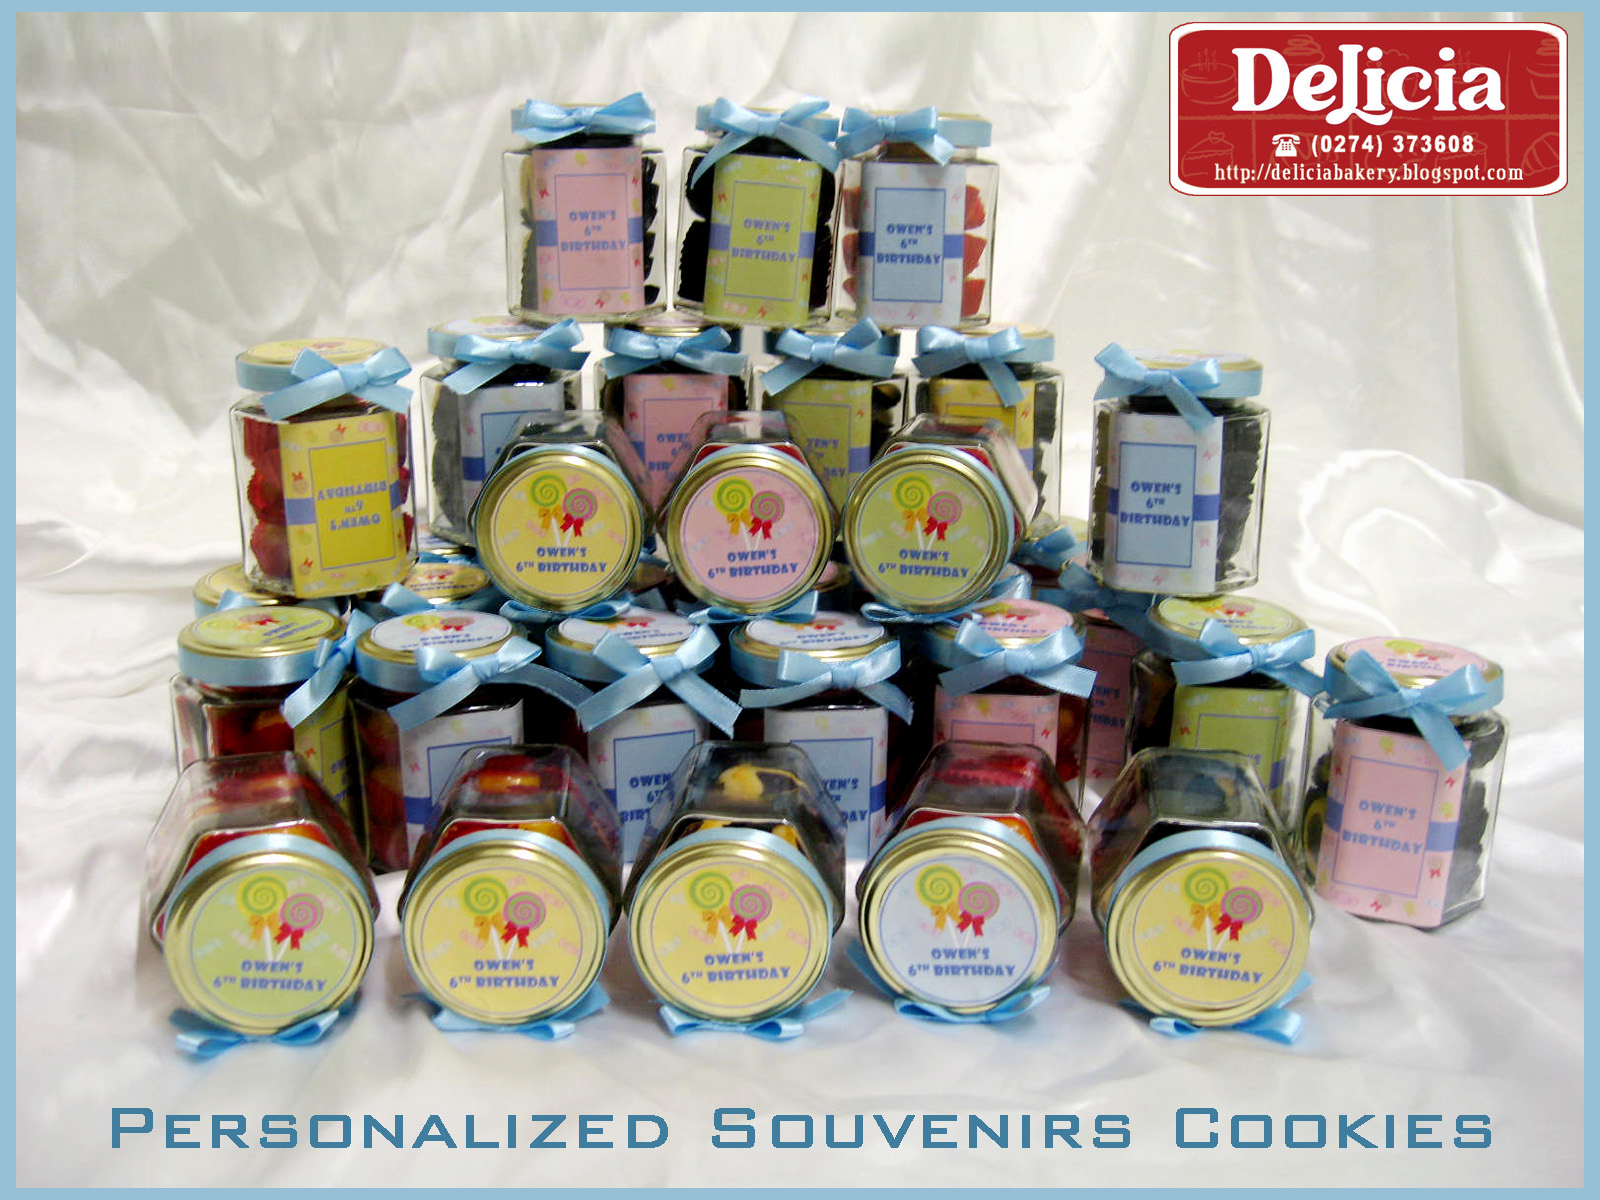 delicia bakery ice cream